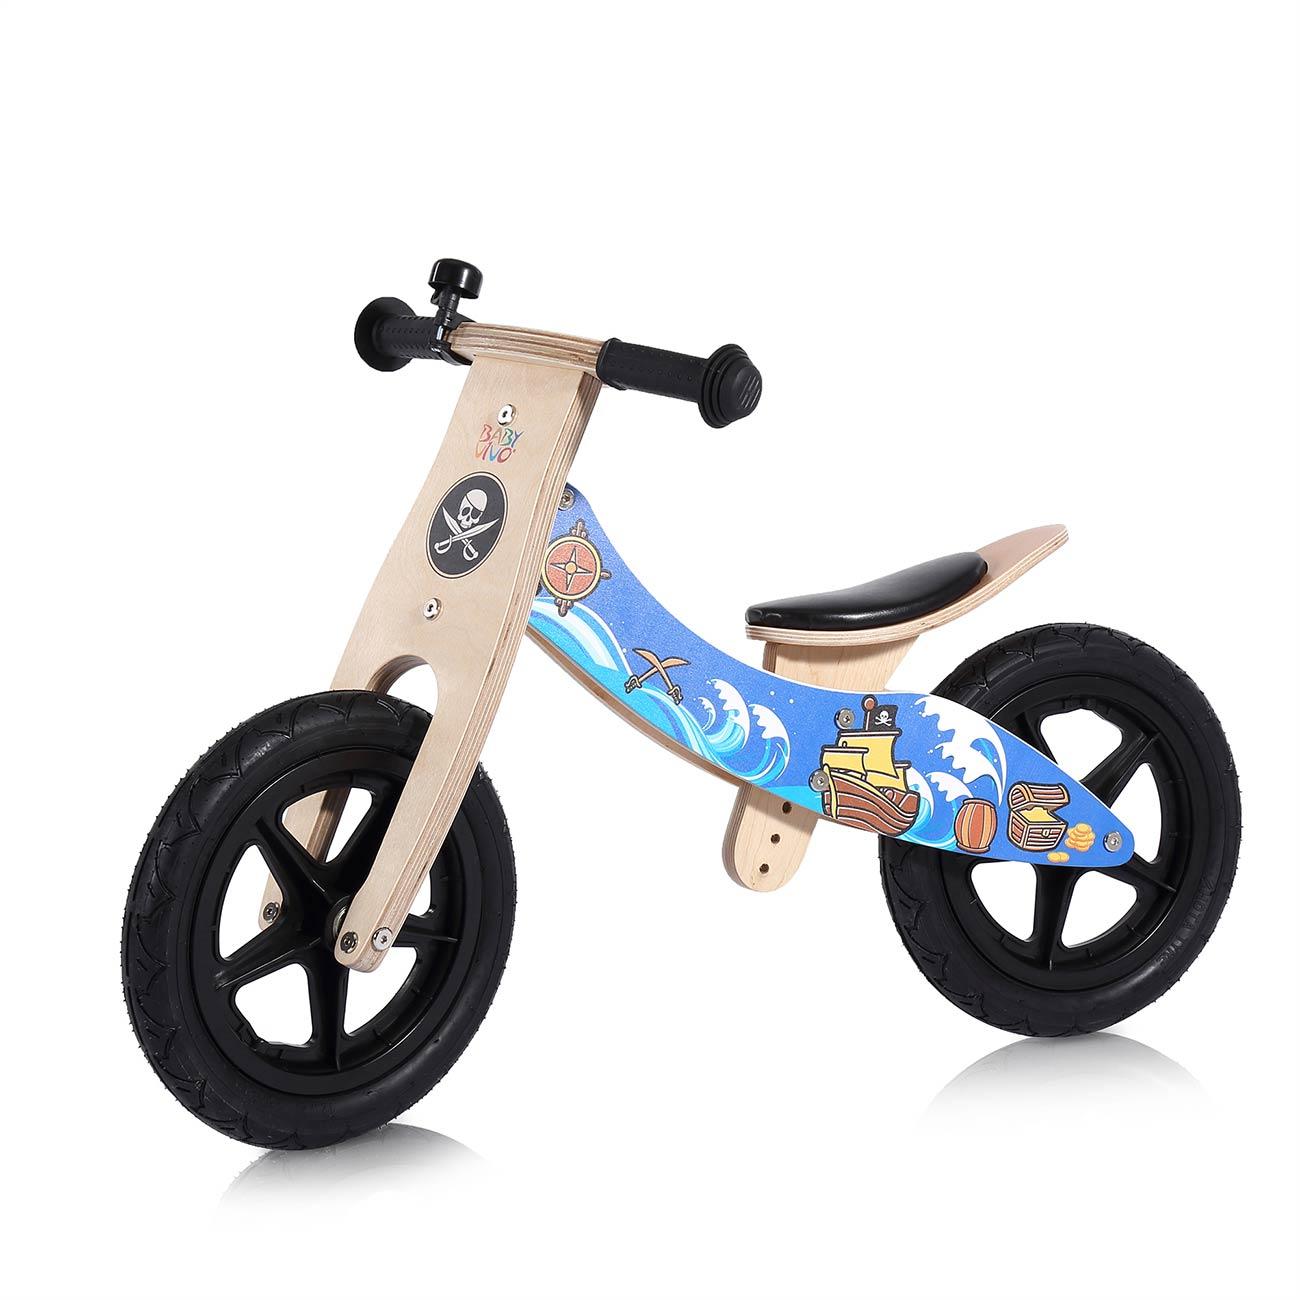 baby vivo 12 zoll kinderlaufrad laufrad aus holz mit klingel jack baby kind spielzeug. Black Bedroom Furniture Sets. Home Design Ideas